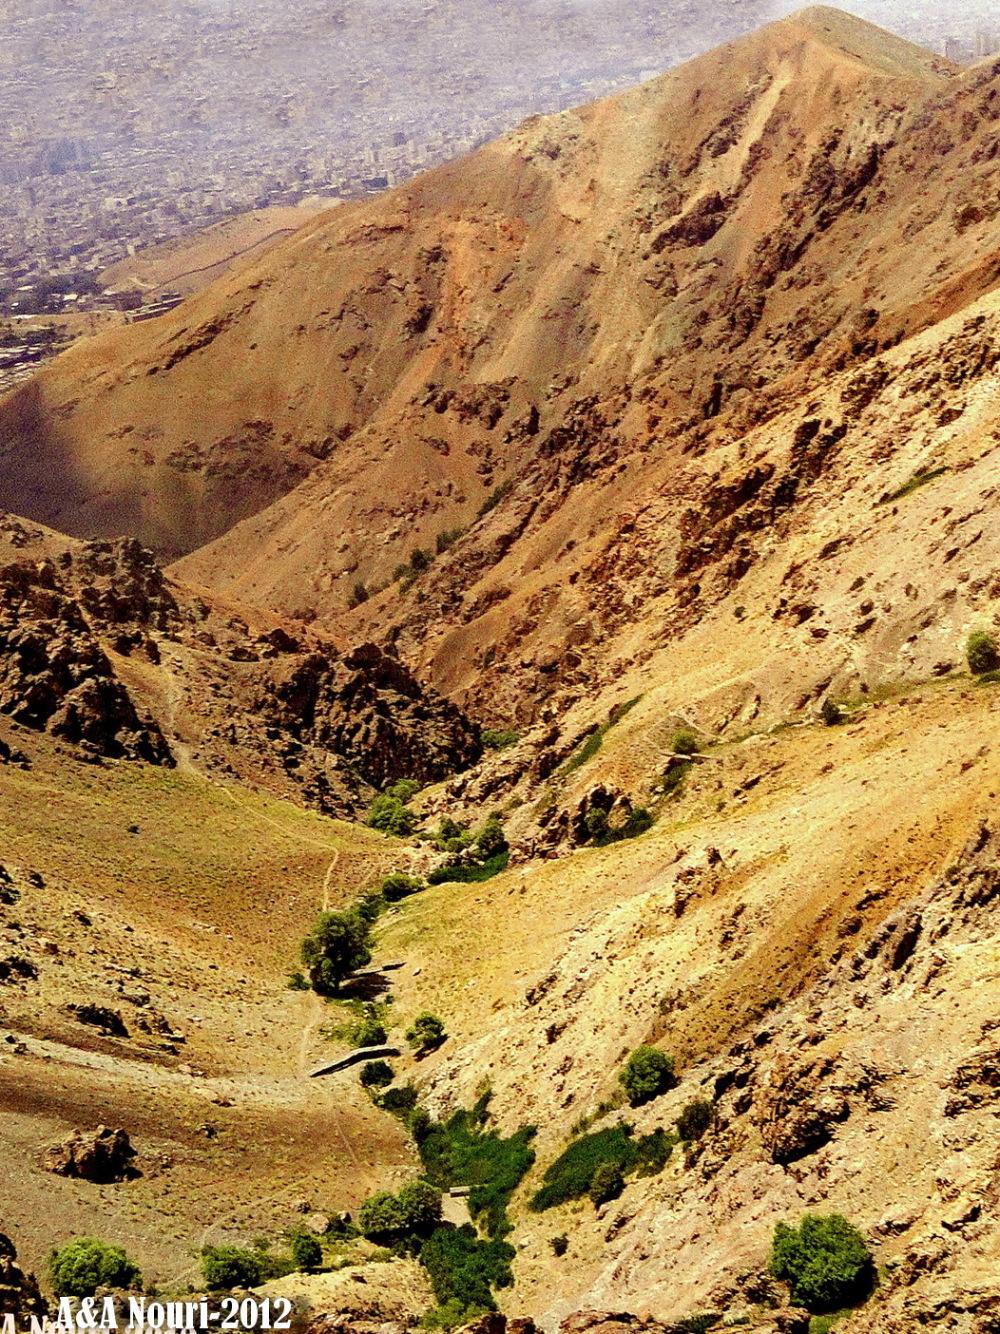 Tehran ' s altitudes